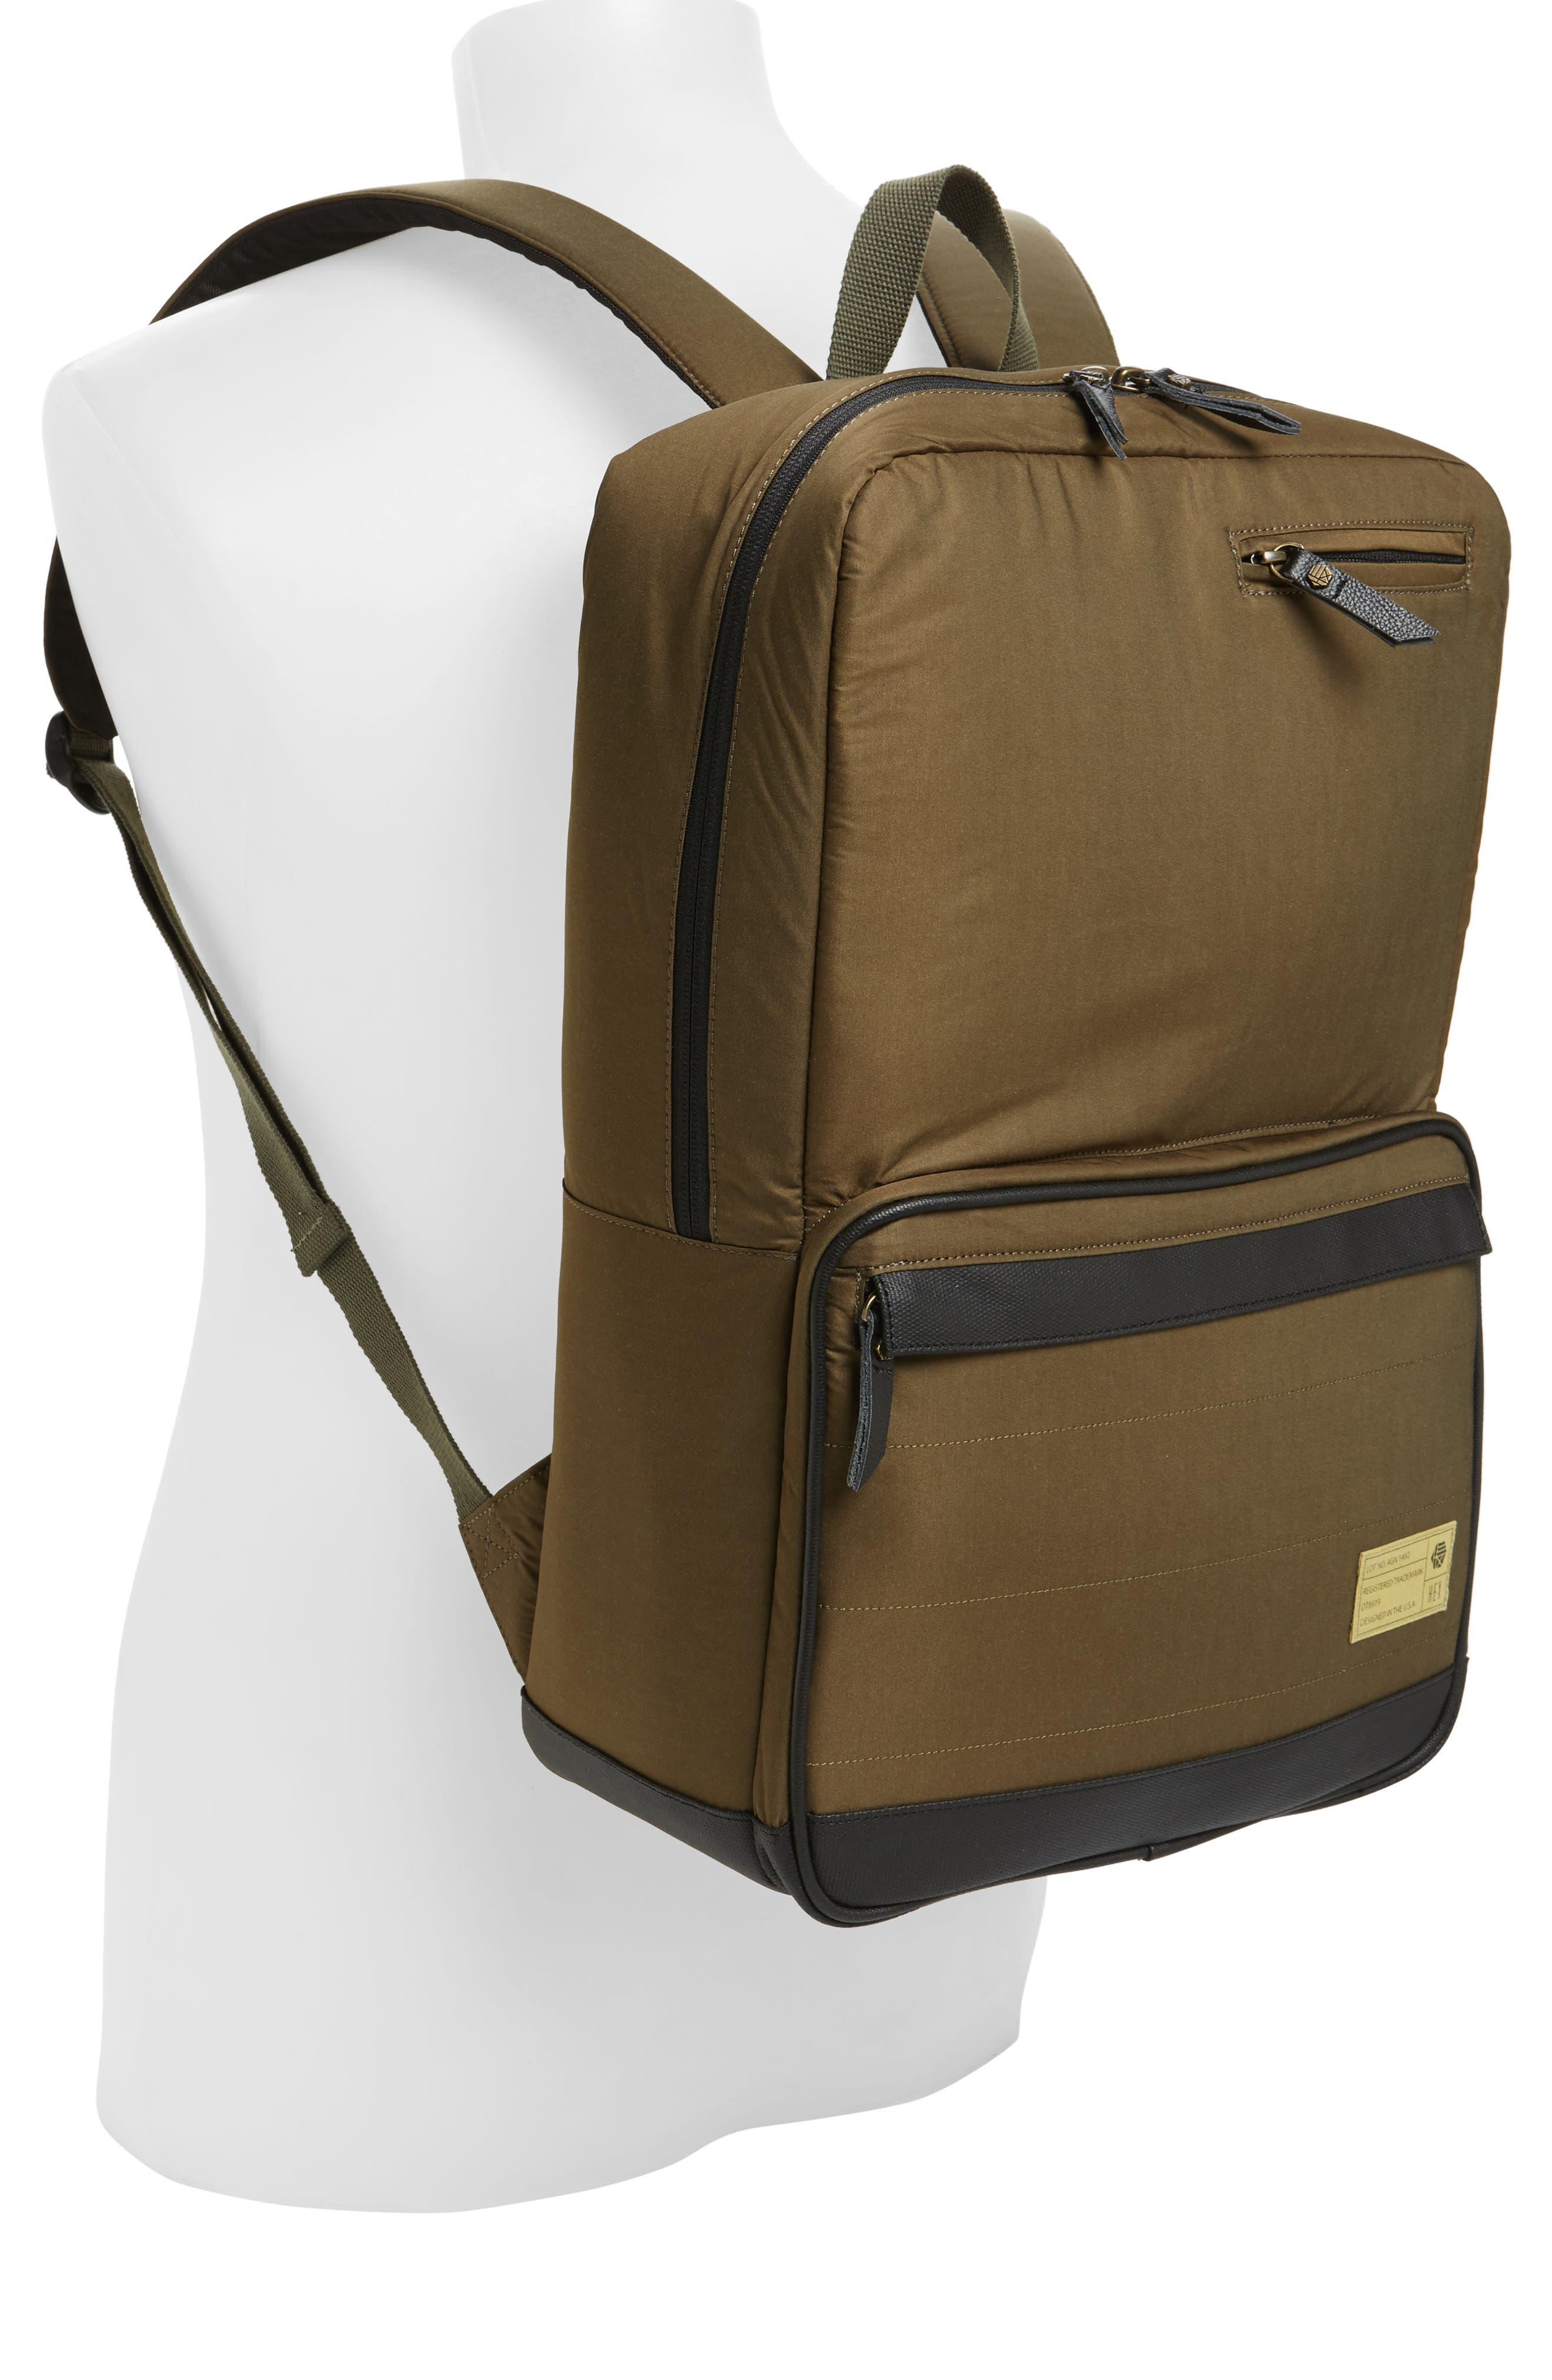 Alternate Image 2  - HEX Radar Origin Water Resistant Commuter/Travel Laptop Backpack